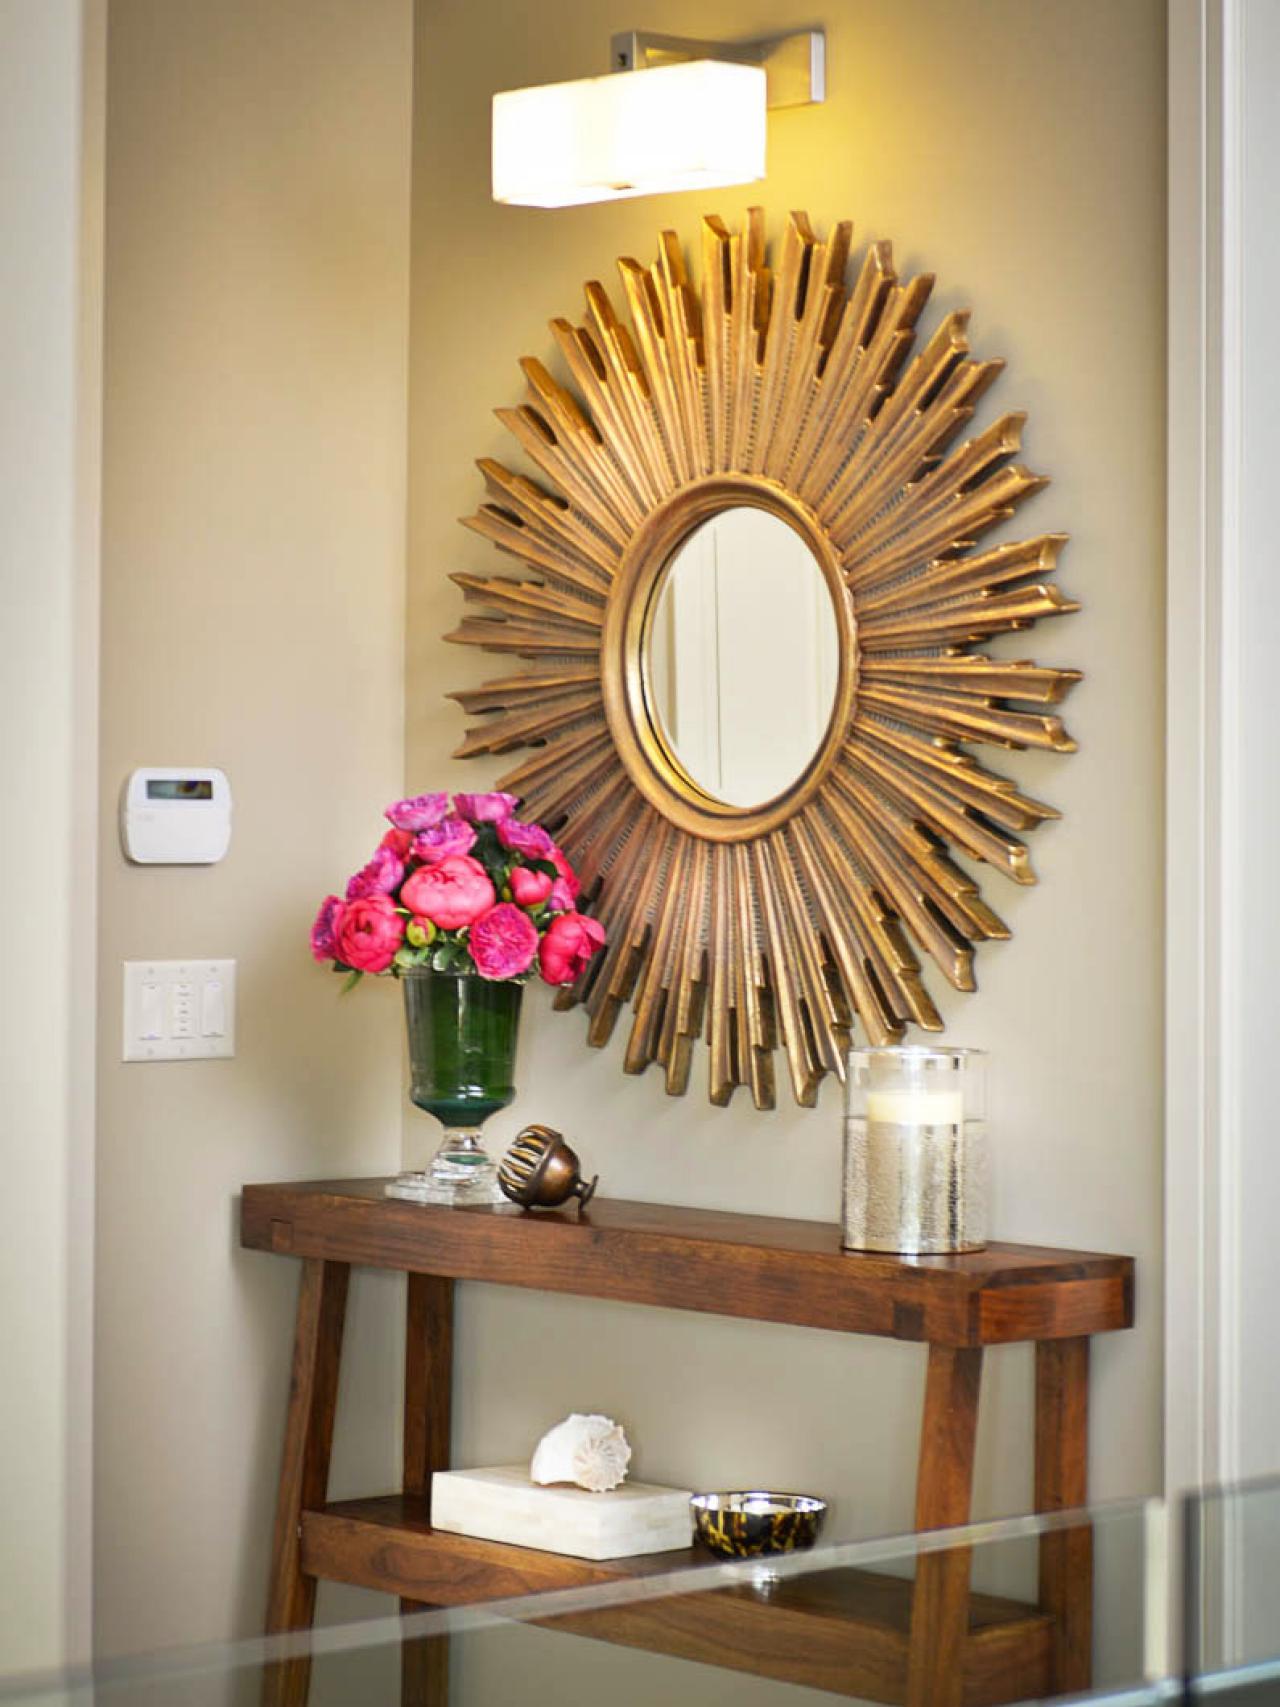 Gold Sunburst Mirror And Rustic Console In Hallway Hgtv